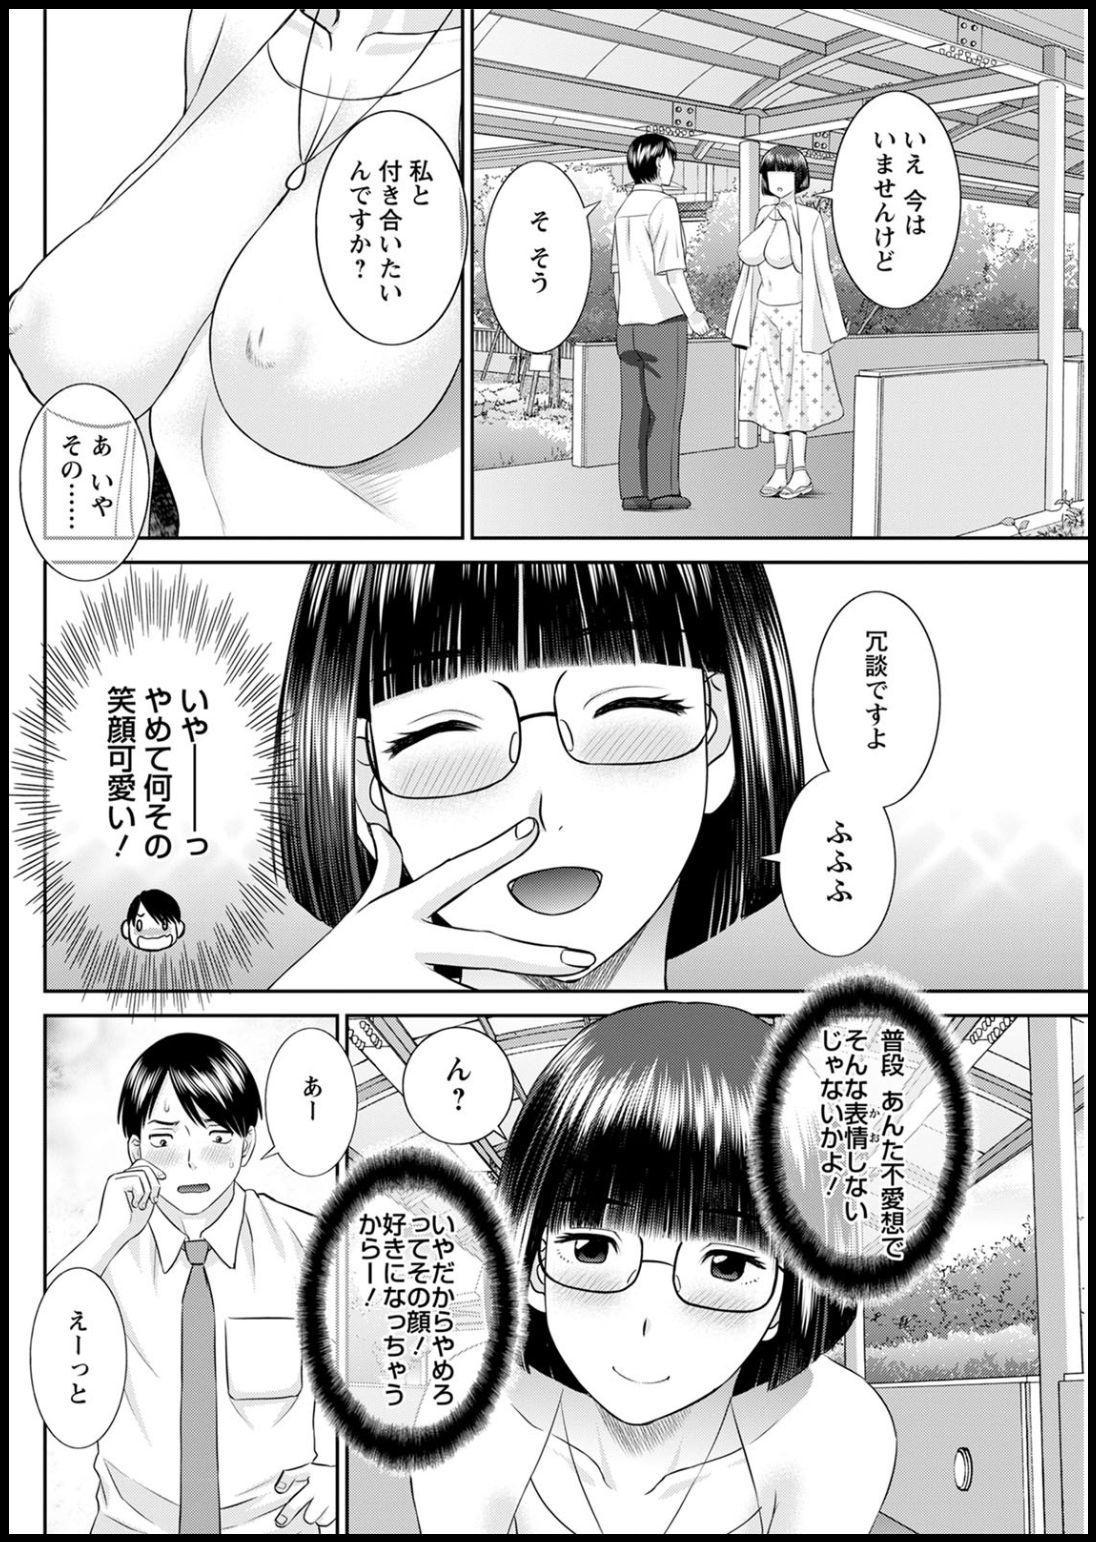 [Kawamori Misaki] Kaikan Hitotsuma Gakuen Ch. 1-6, 8-20 [Digital] 280